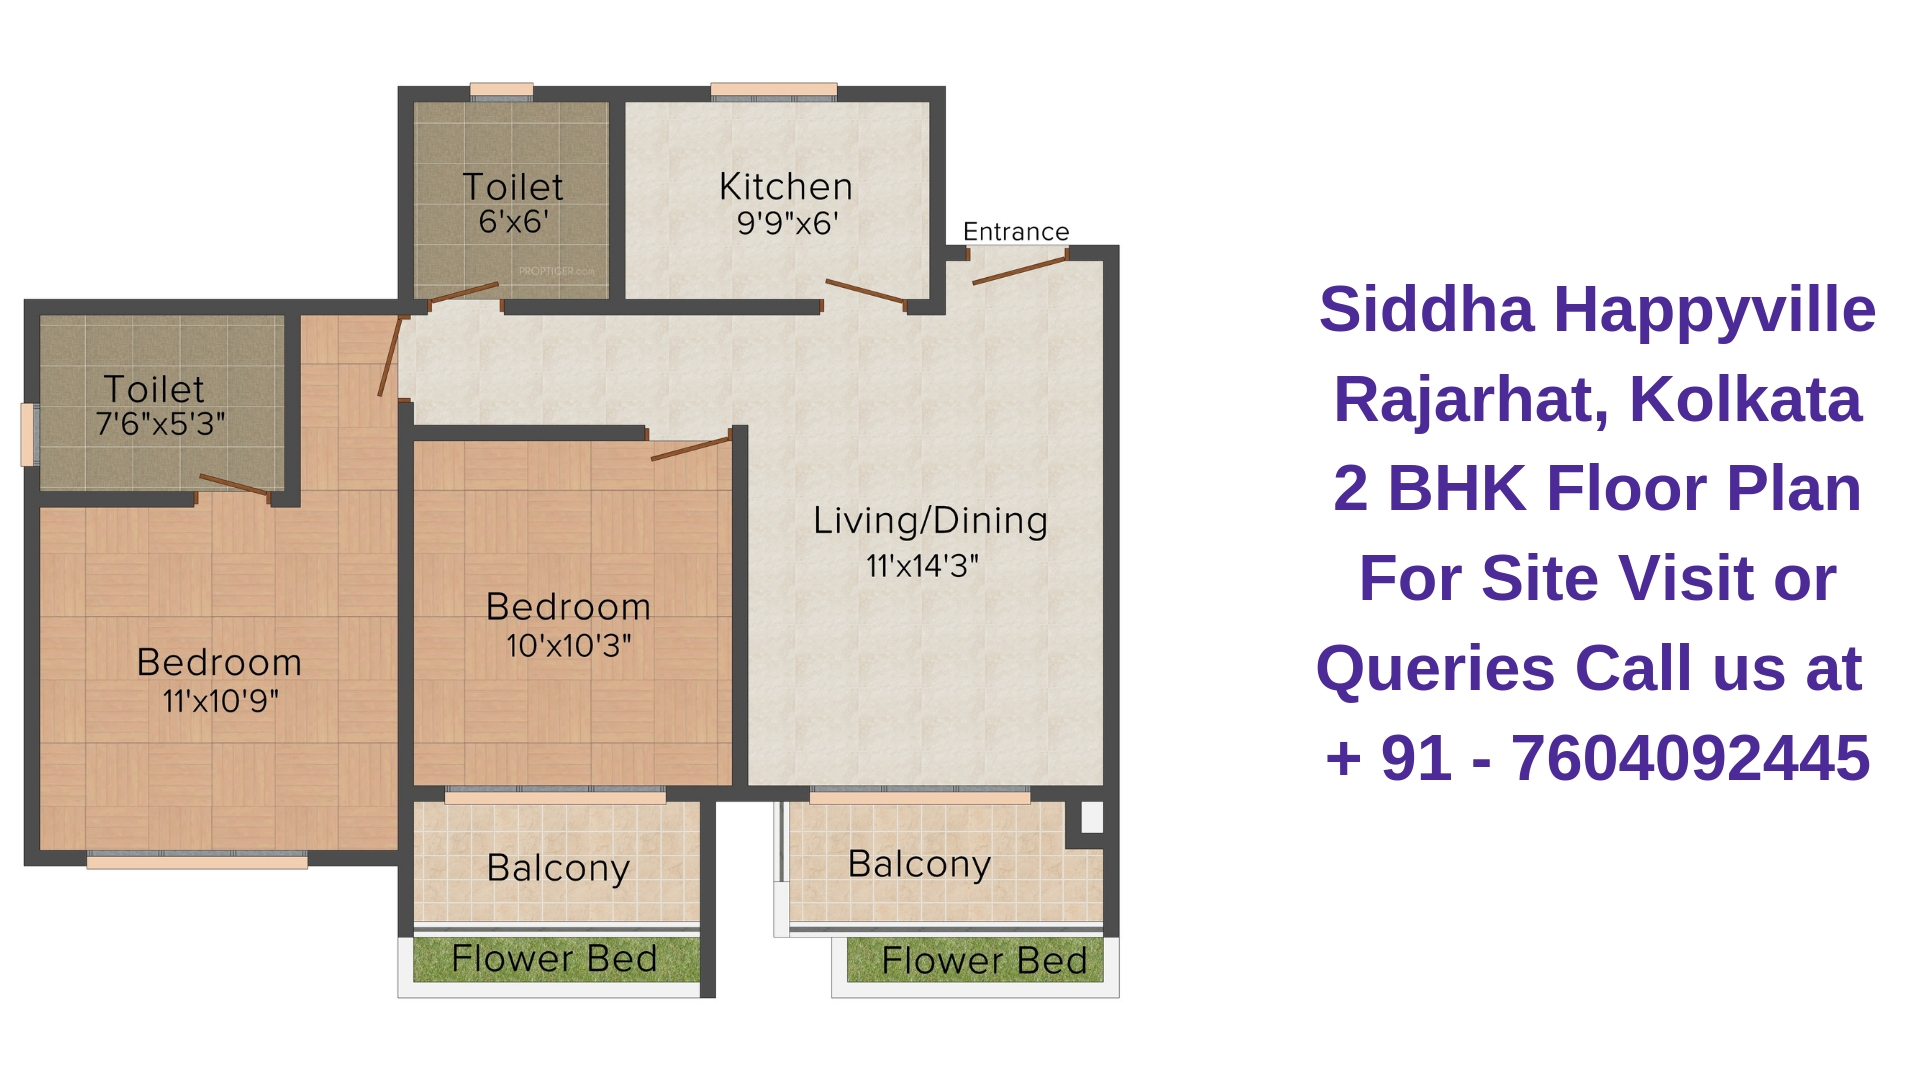 Siddha Happyville Rajarhat, Kolkata 2 BHK Floor Plan